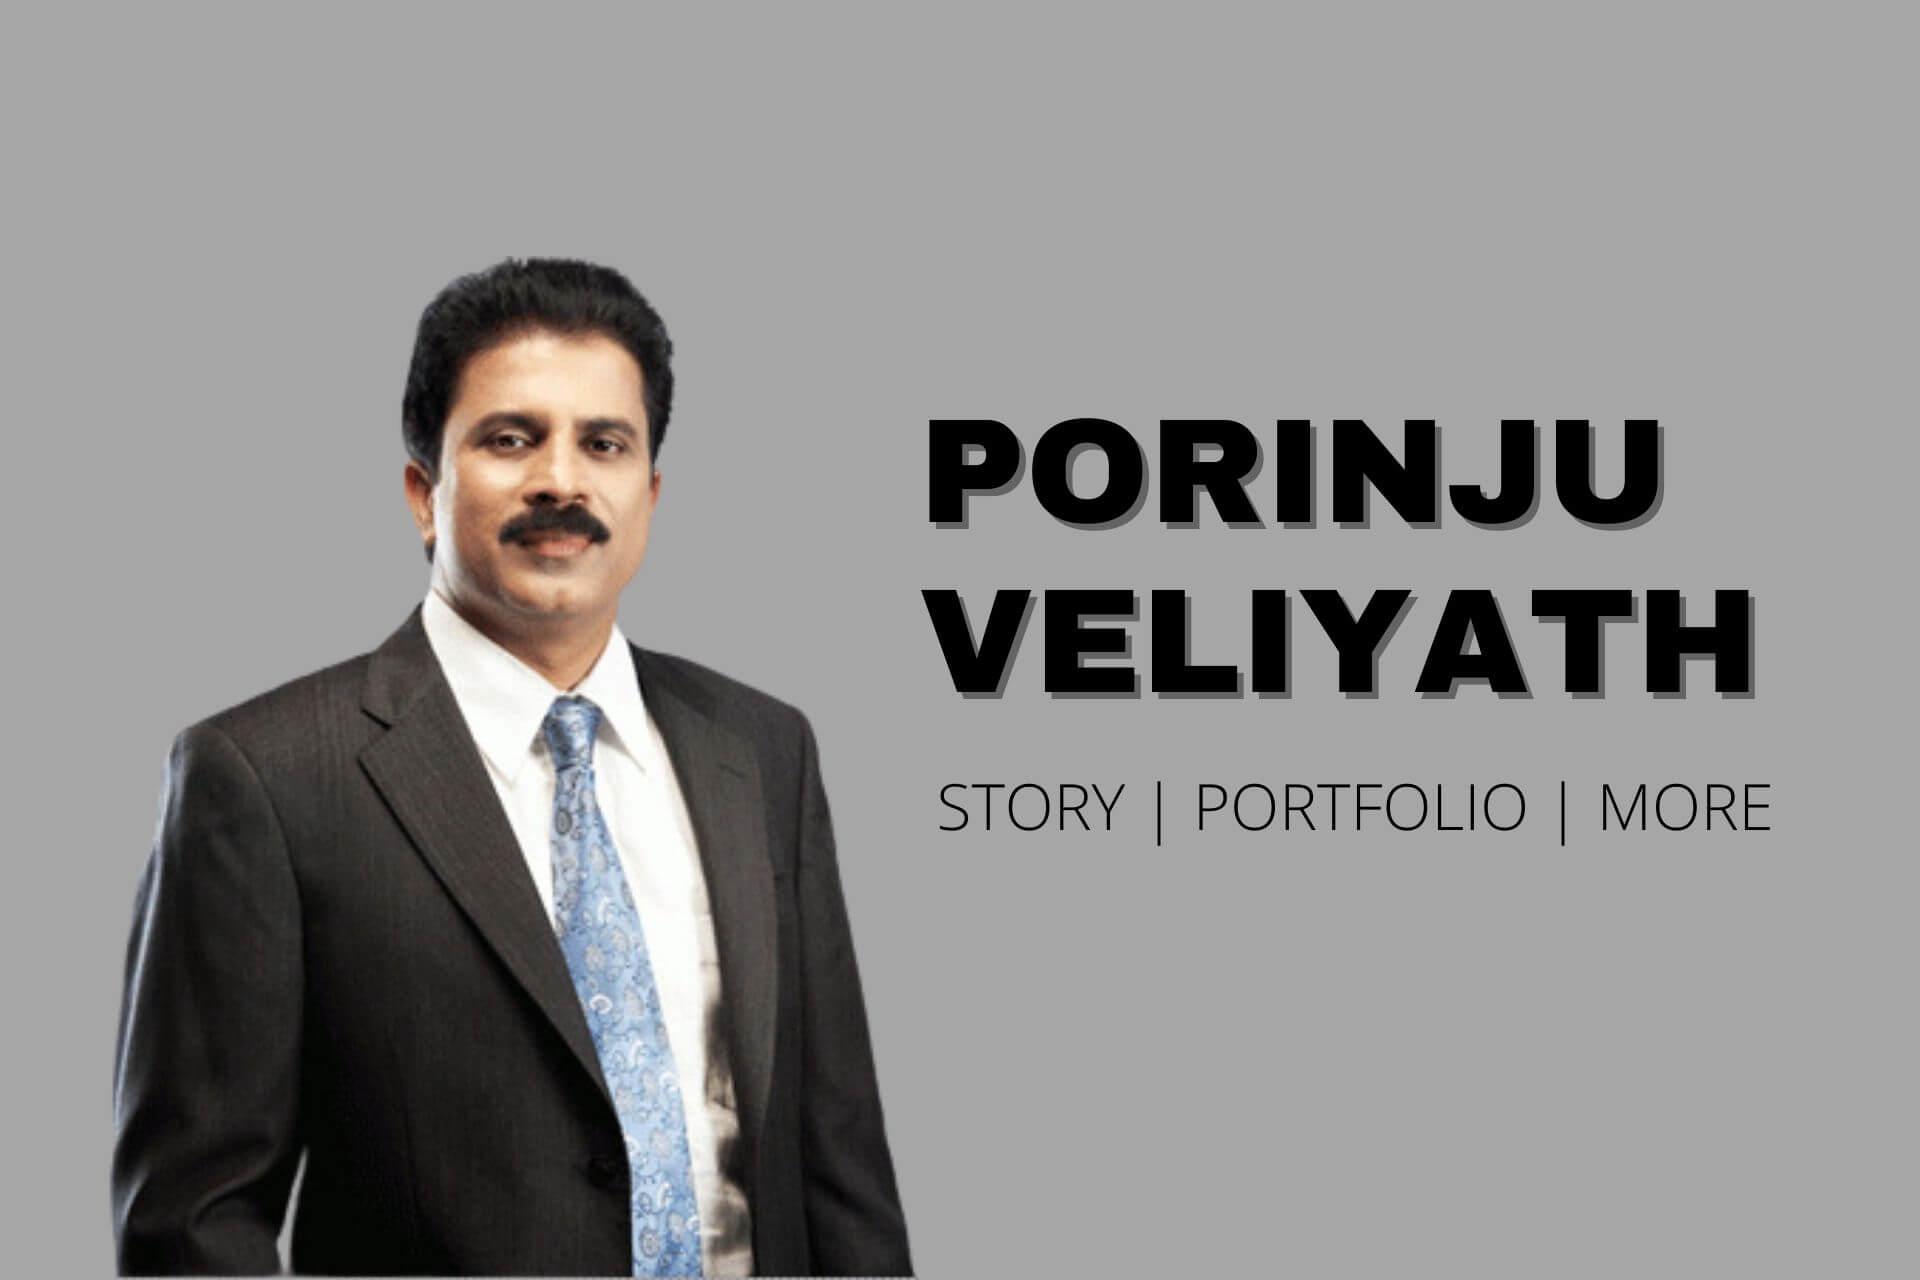 Porinju Veliyath Success Story